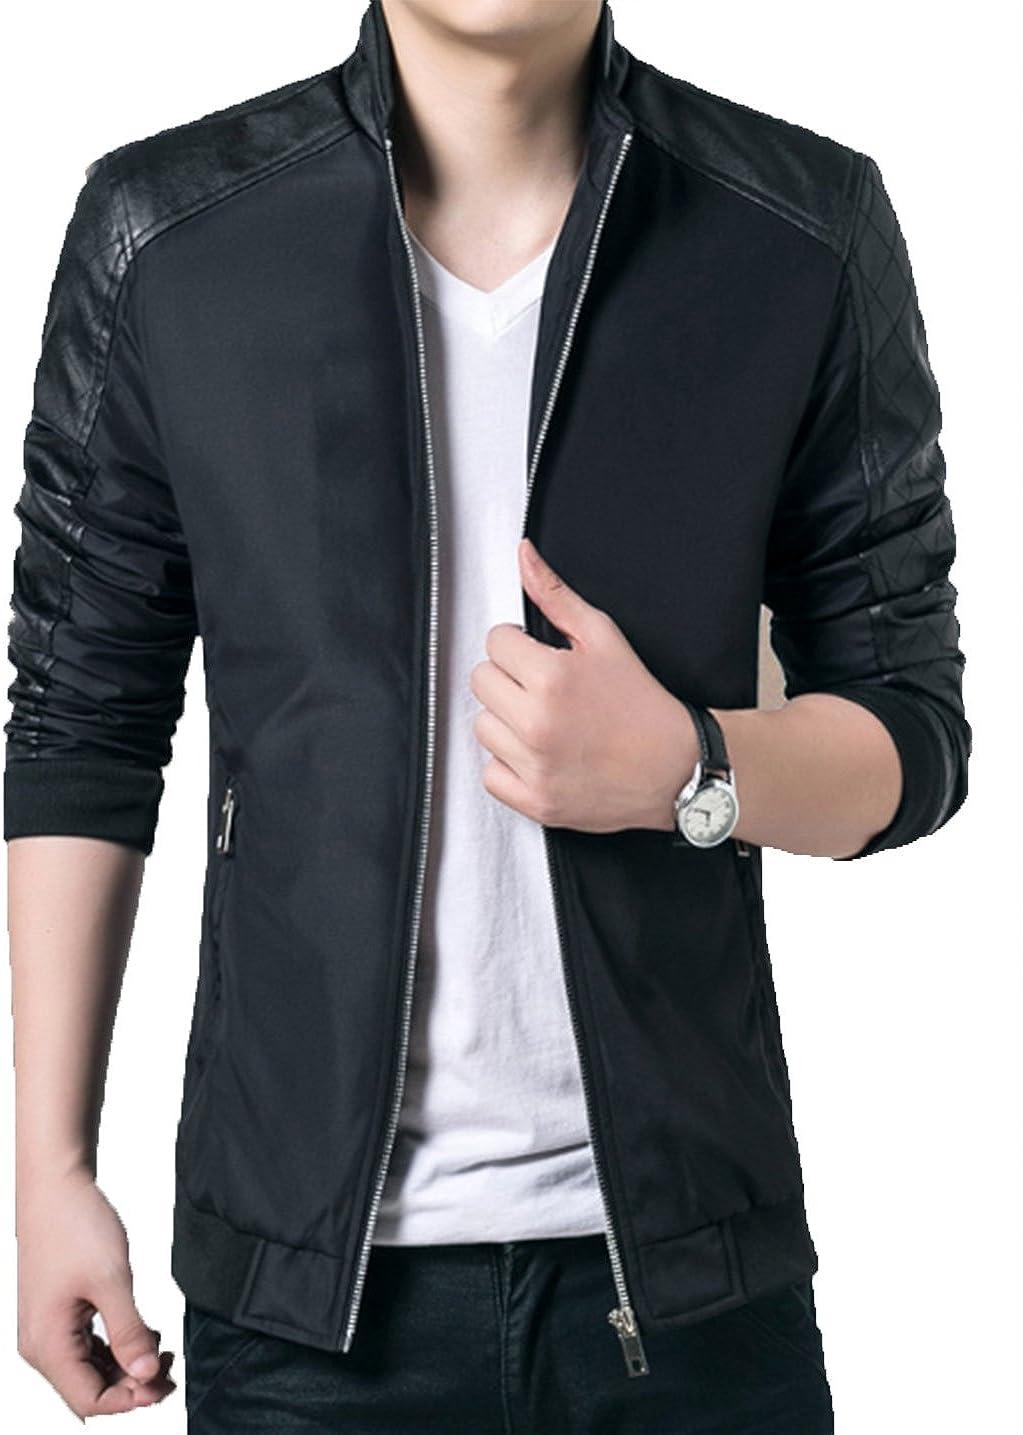 Olrek Men's Lightweight Casual Outdoor Over item handling ☆ Wear Jackets Industry No. 1 Windbreaker